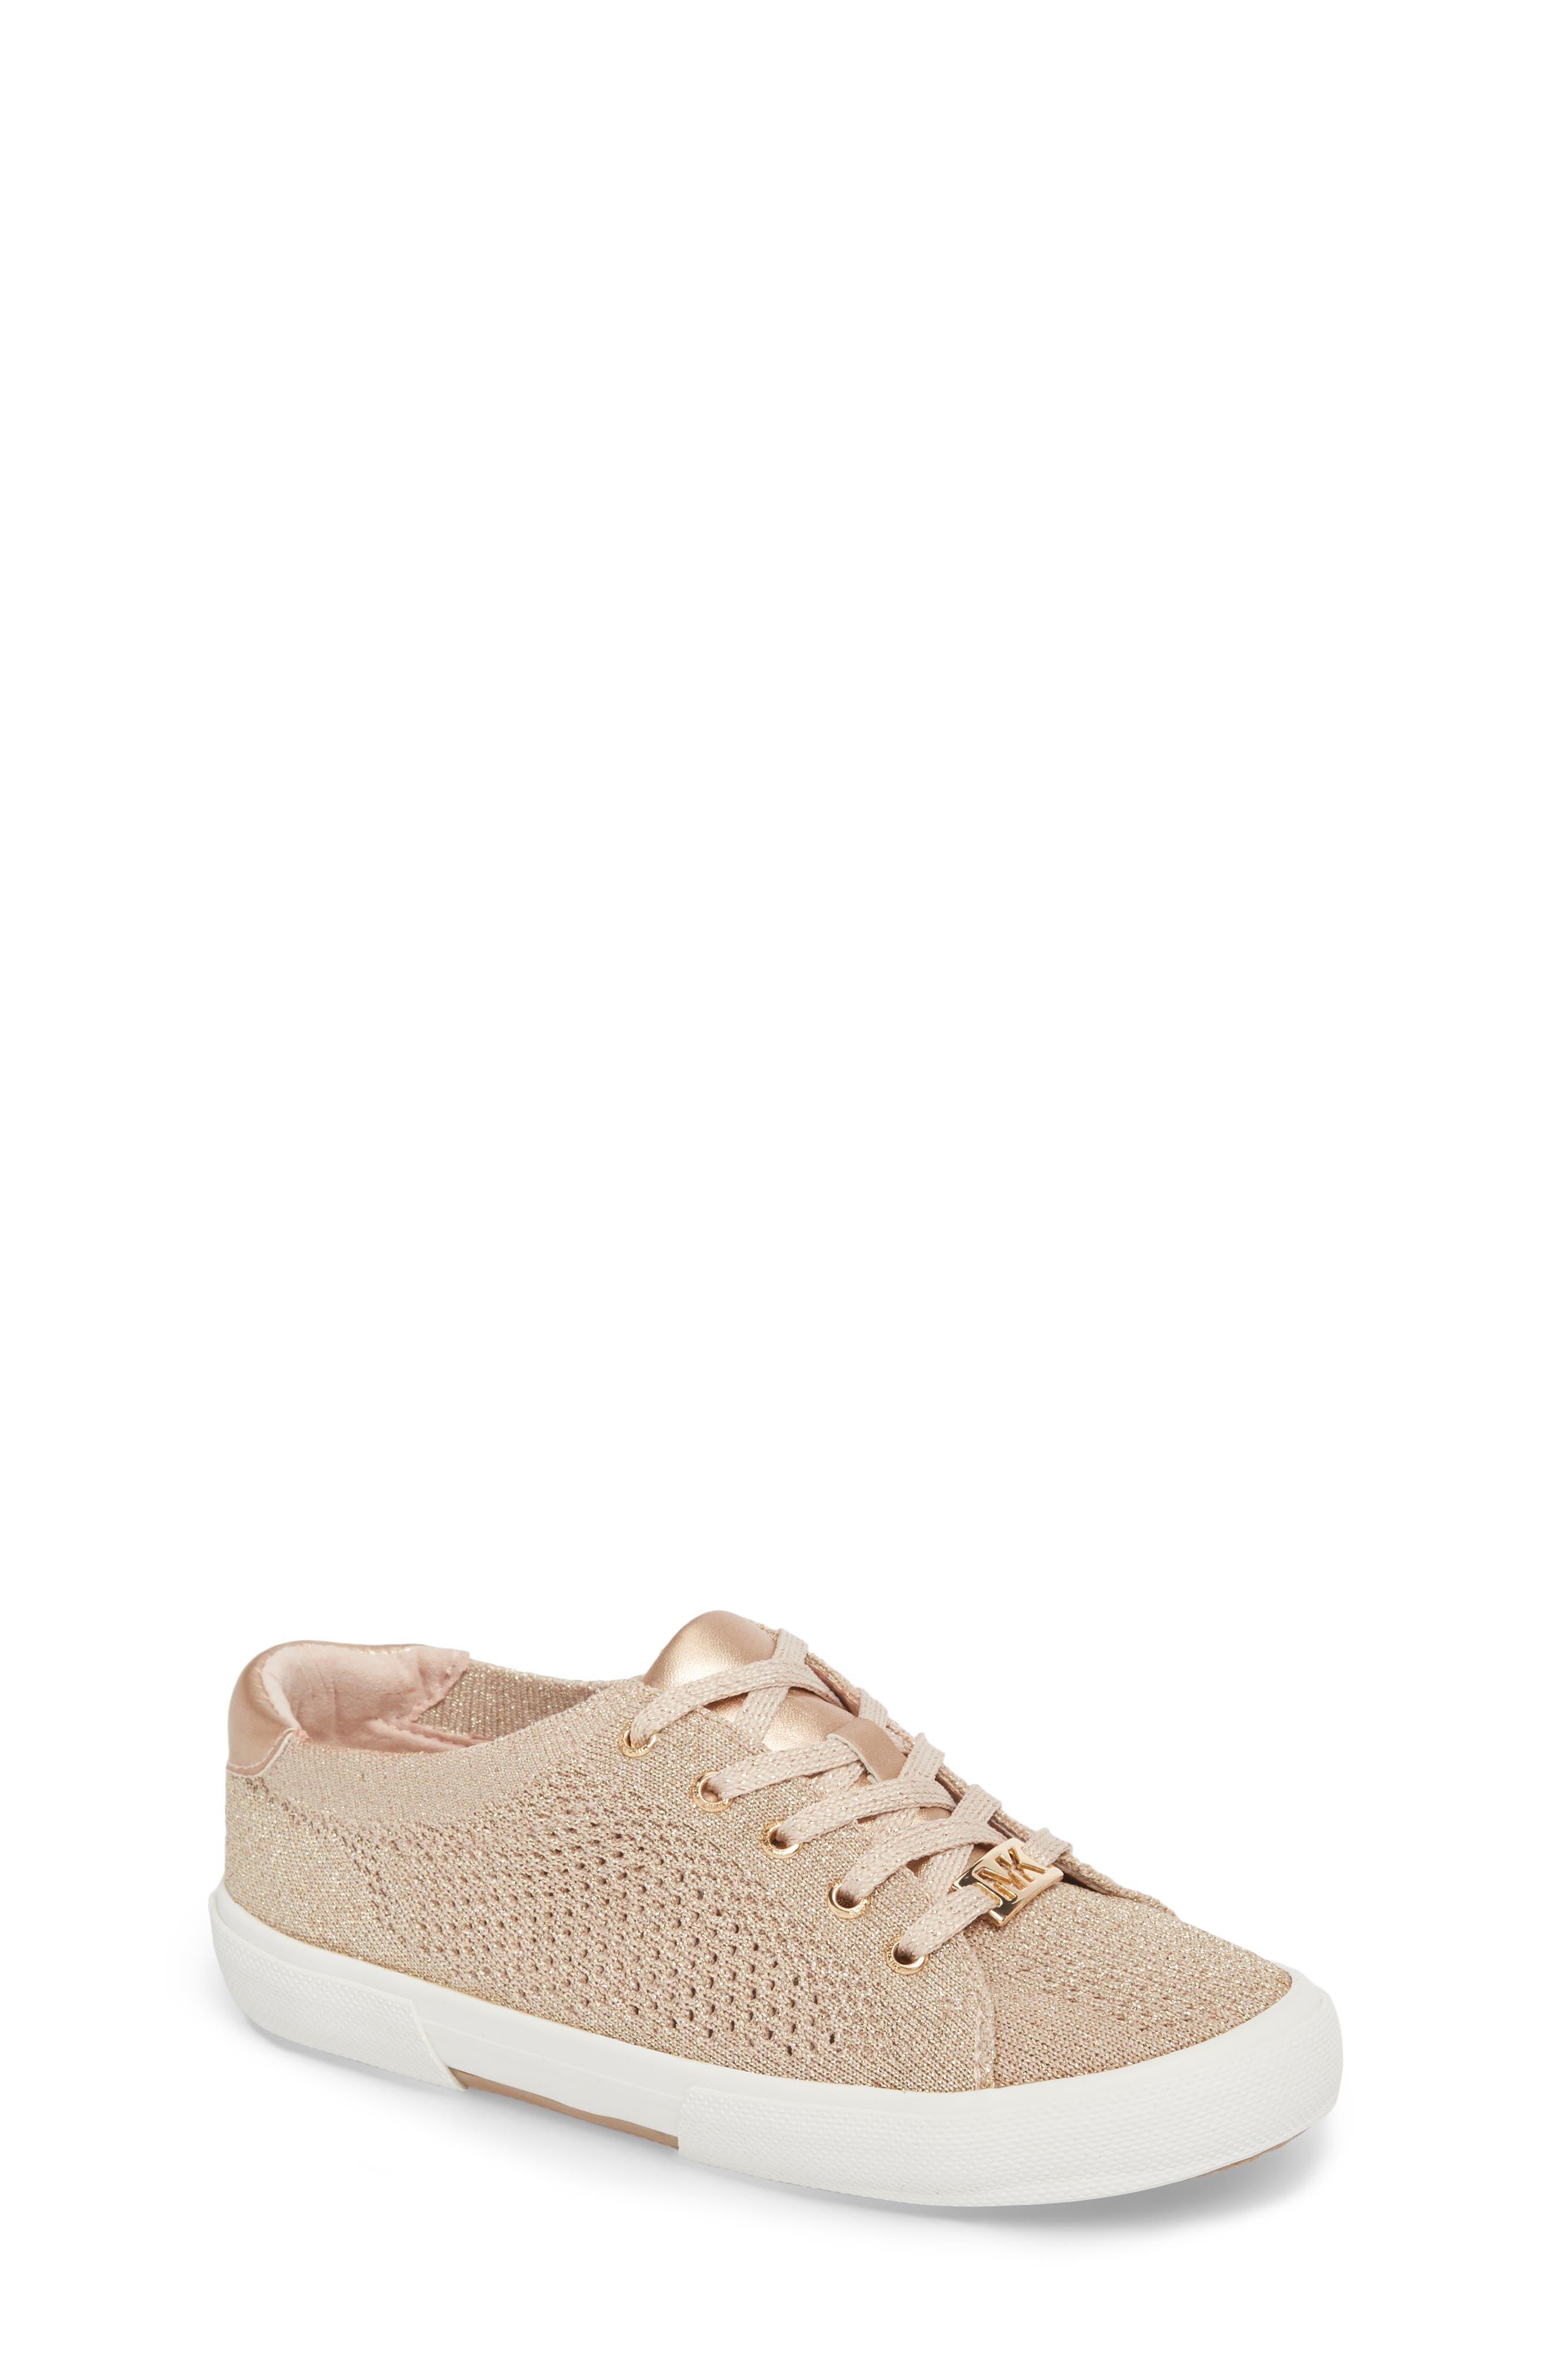 Ima Metallic Knit Sneaker,                         Main,                         color, BLUSH SHIMMER